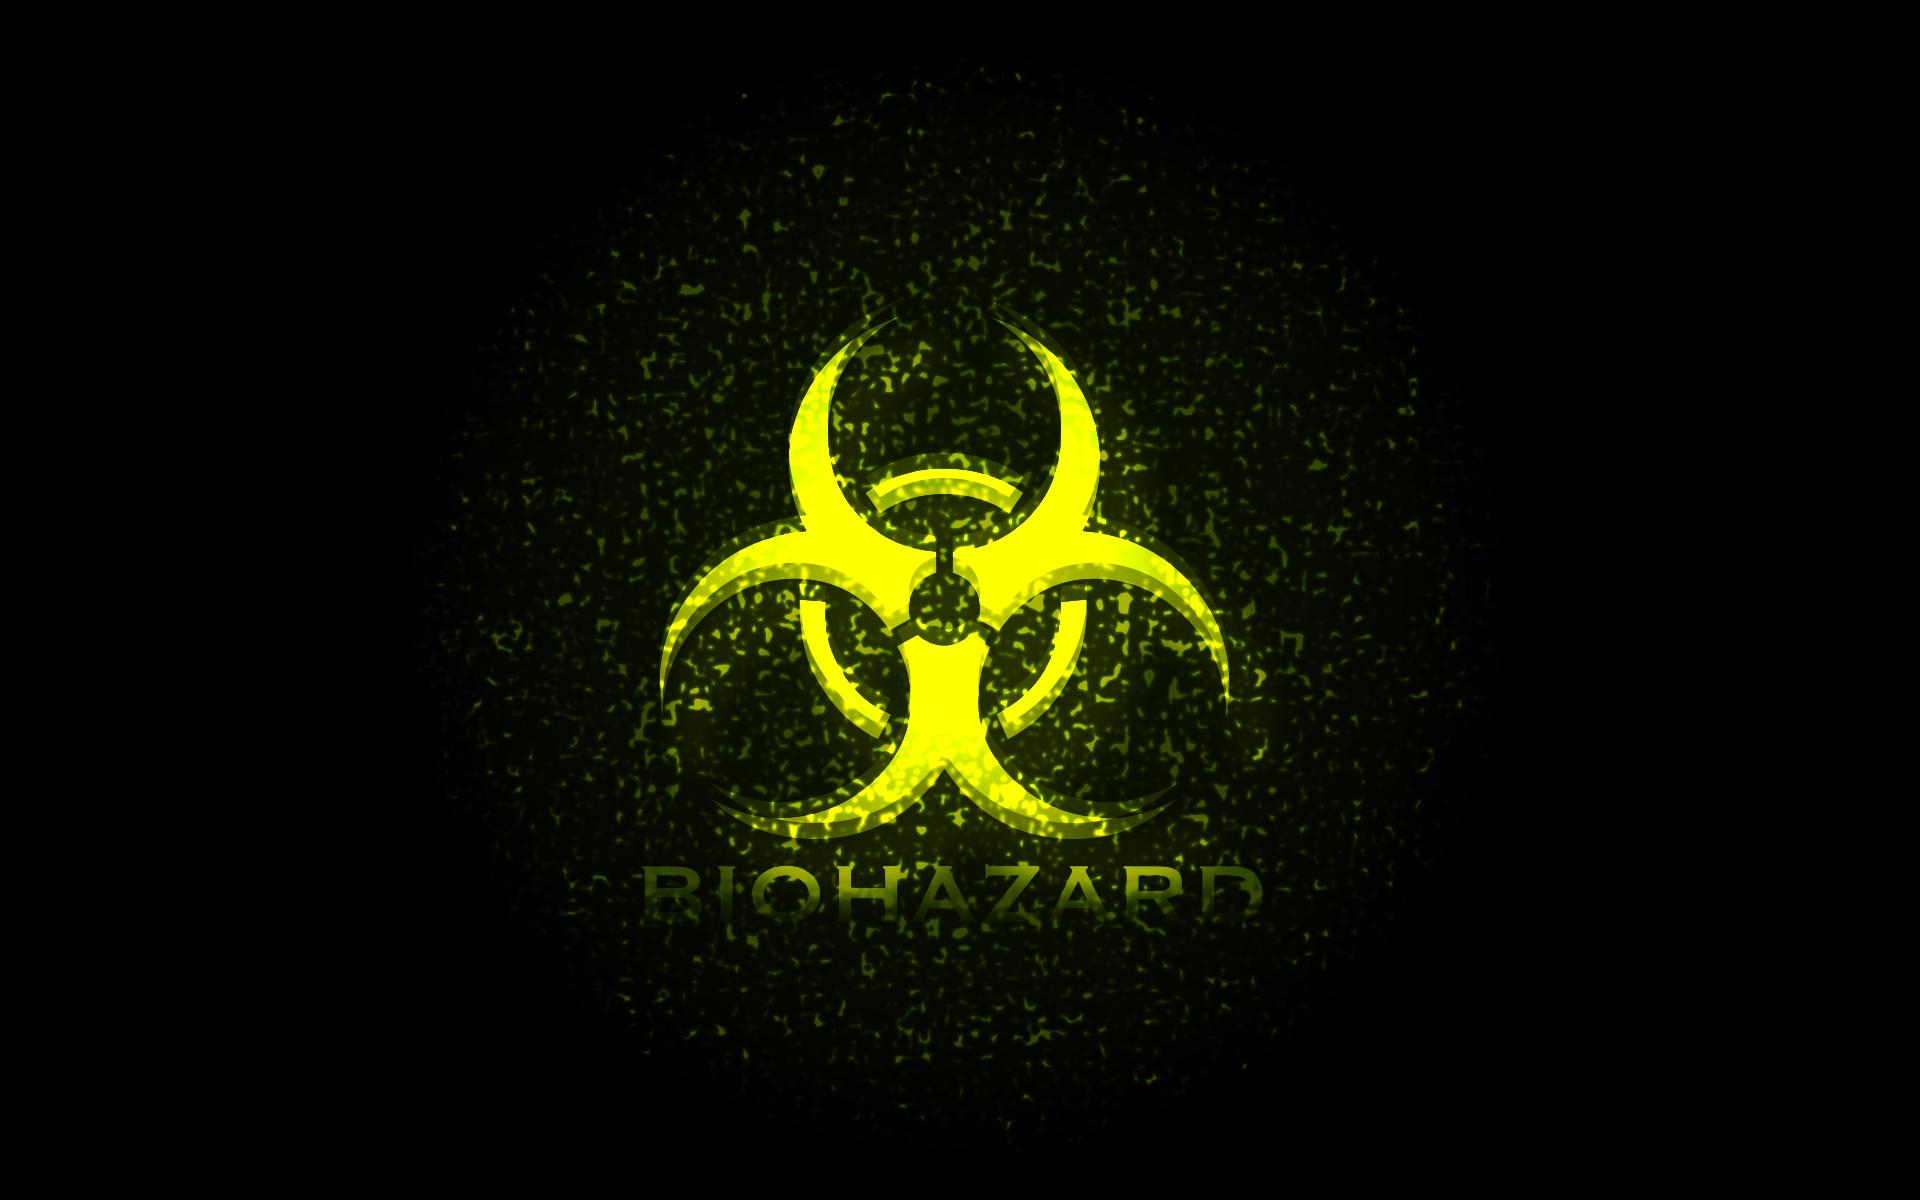 Biohazard Symbol Wallpaper 1920x1200 Biohazard Symbol 1920x1200